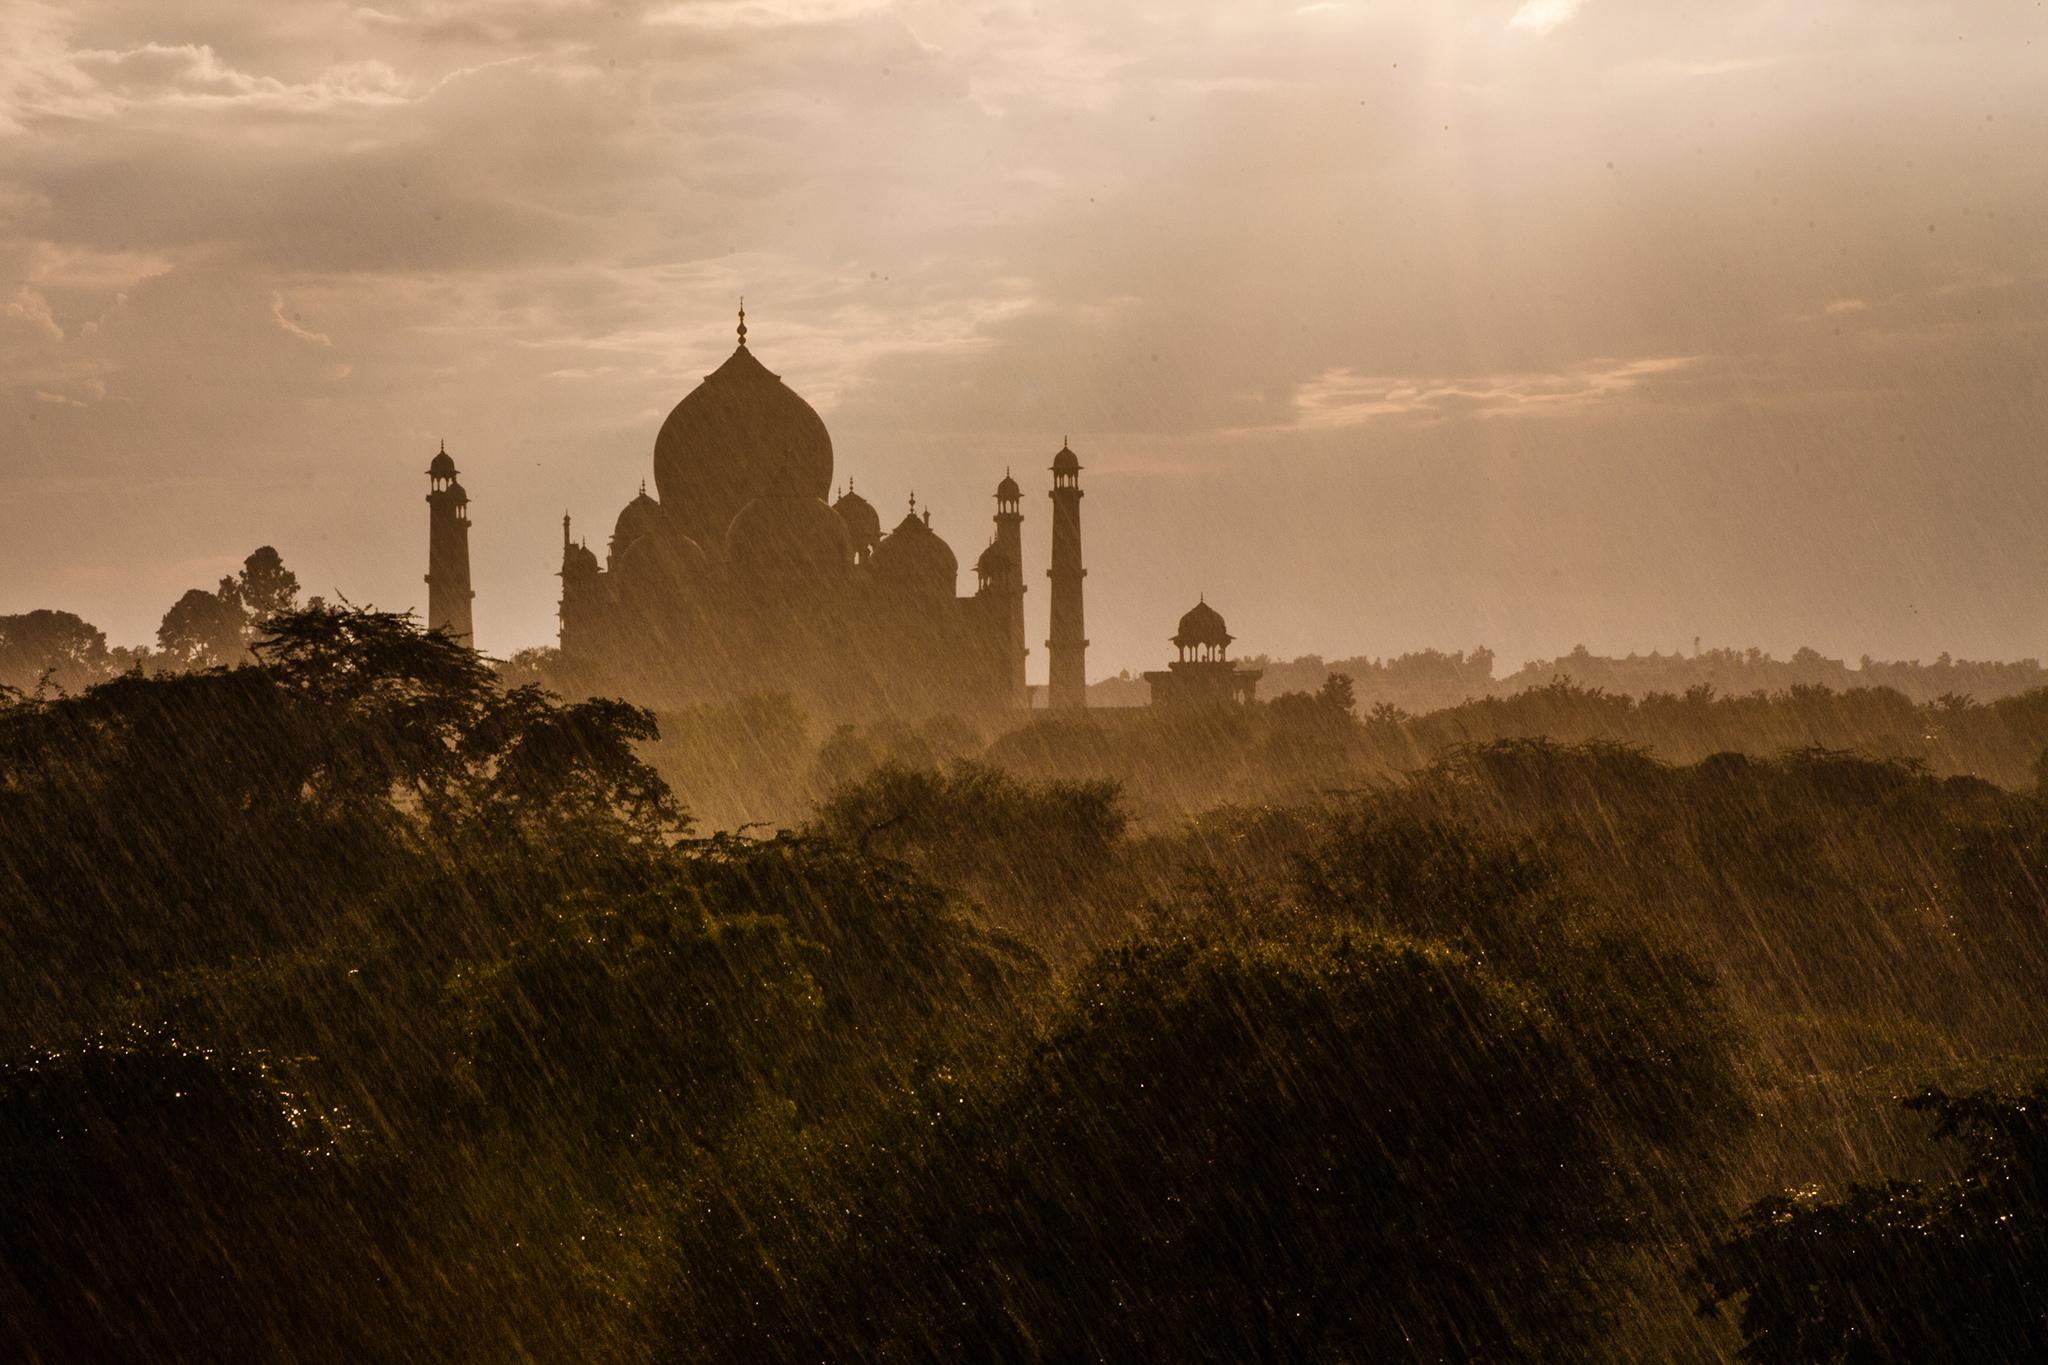 Вид на Тадж-Махал в дождливую погоду, Индия